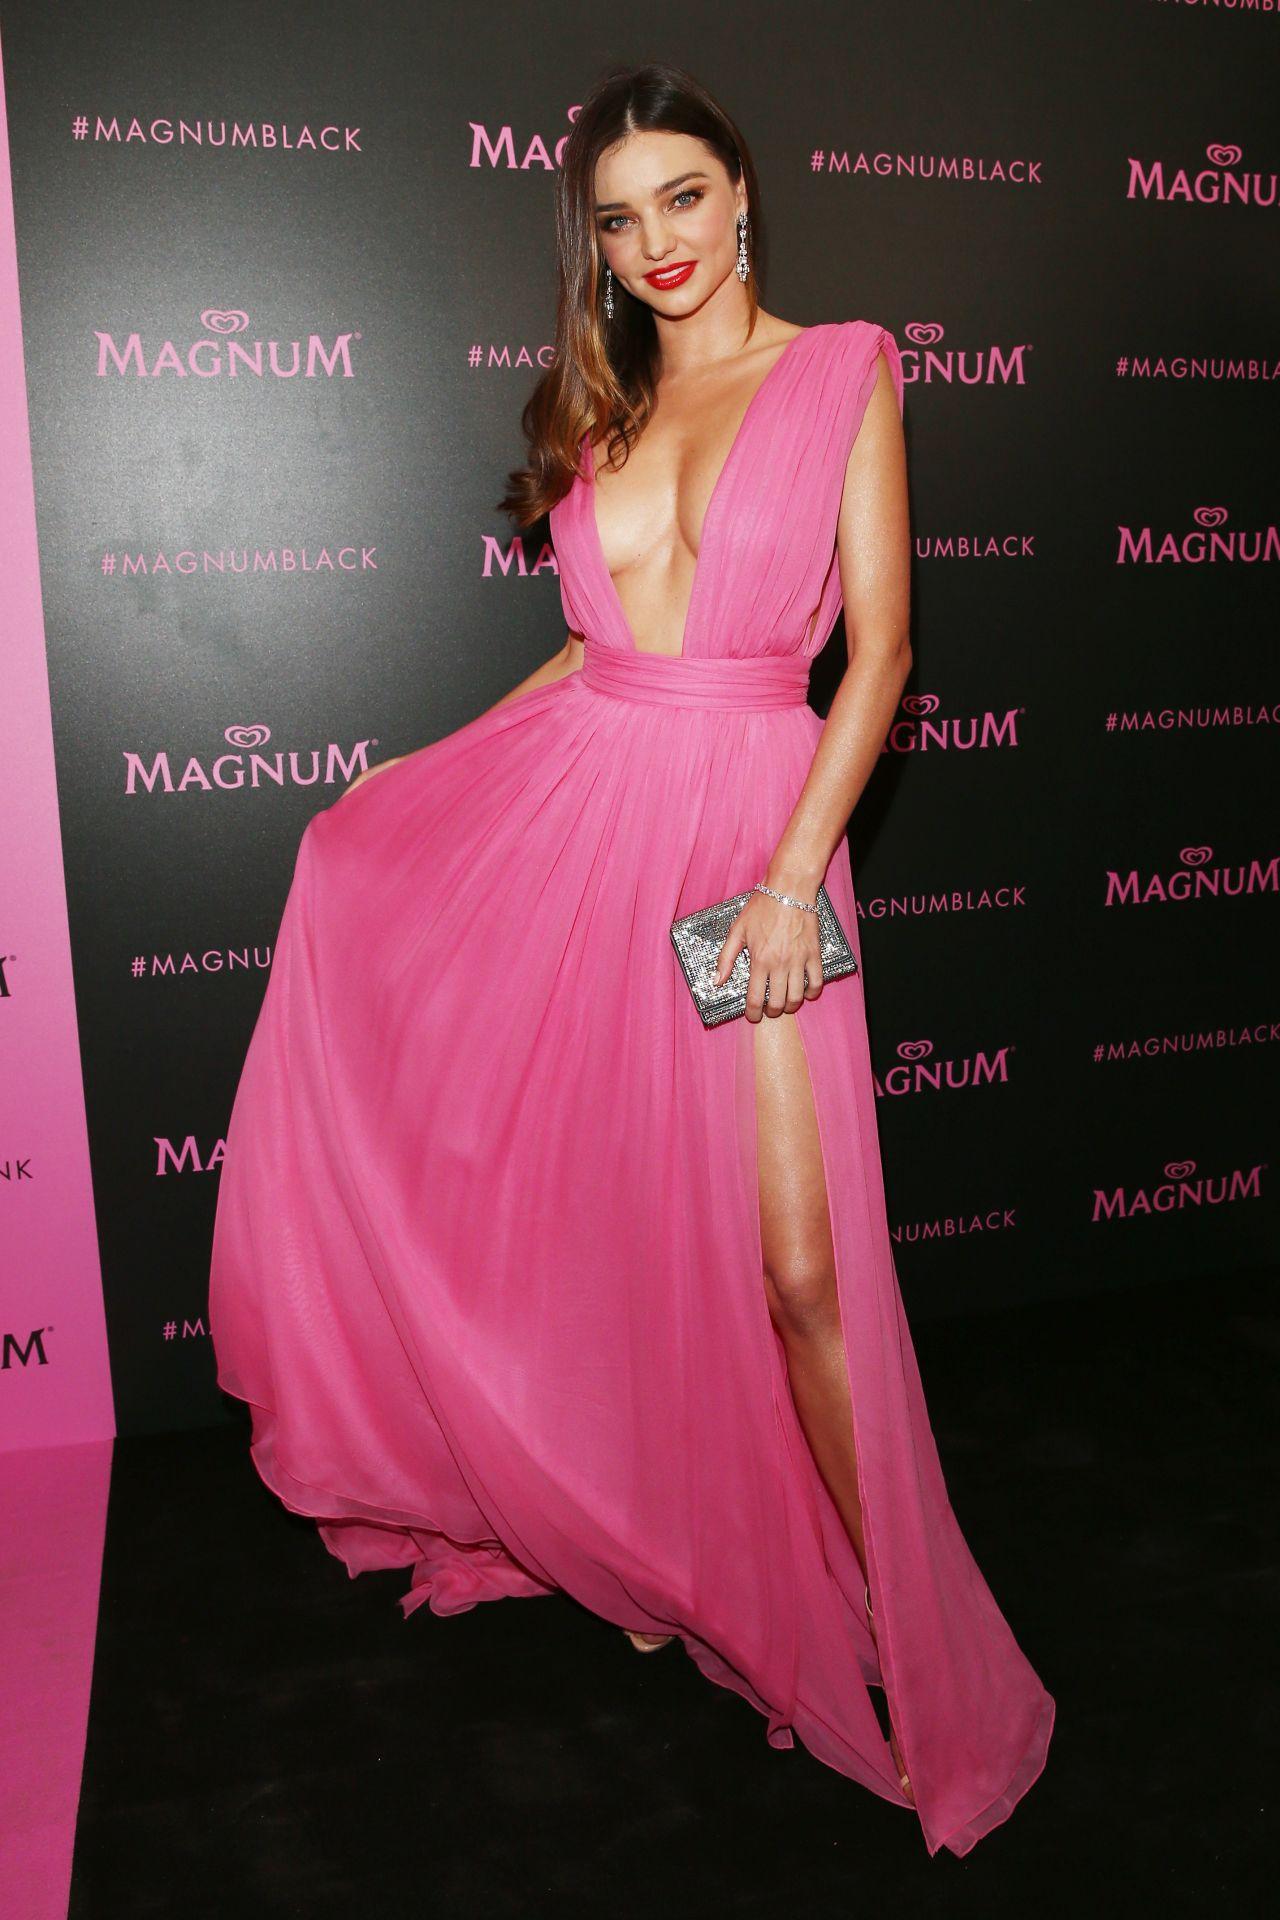 Miranda Kerr - Magnum Pink and Black Launch at Magnum ... миранда керр